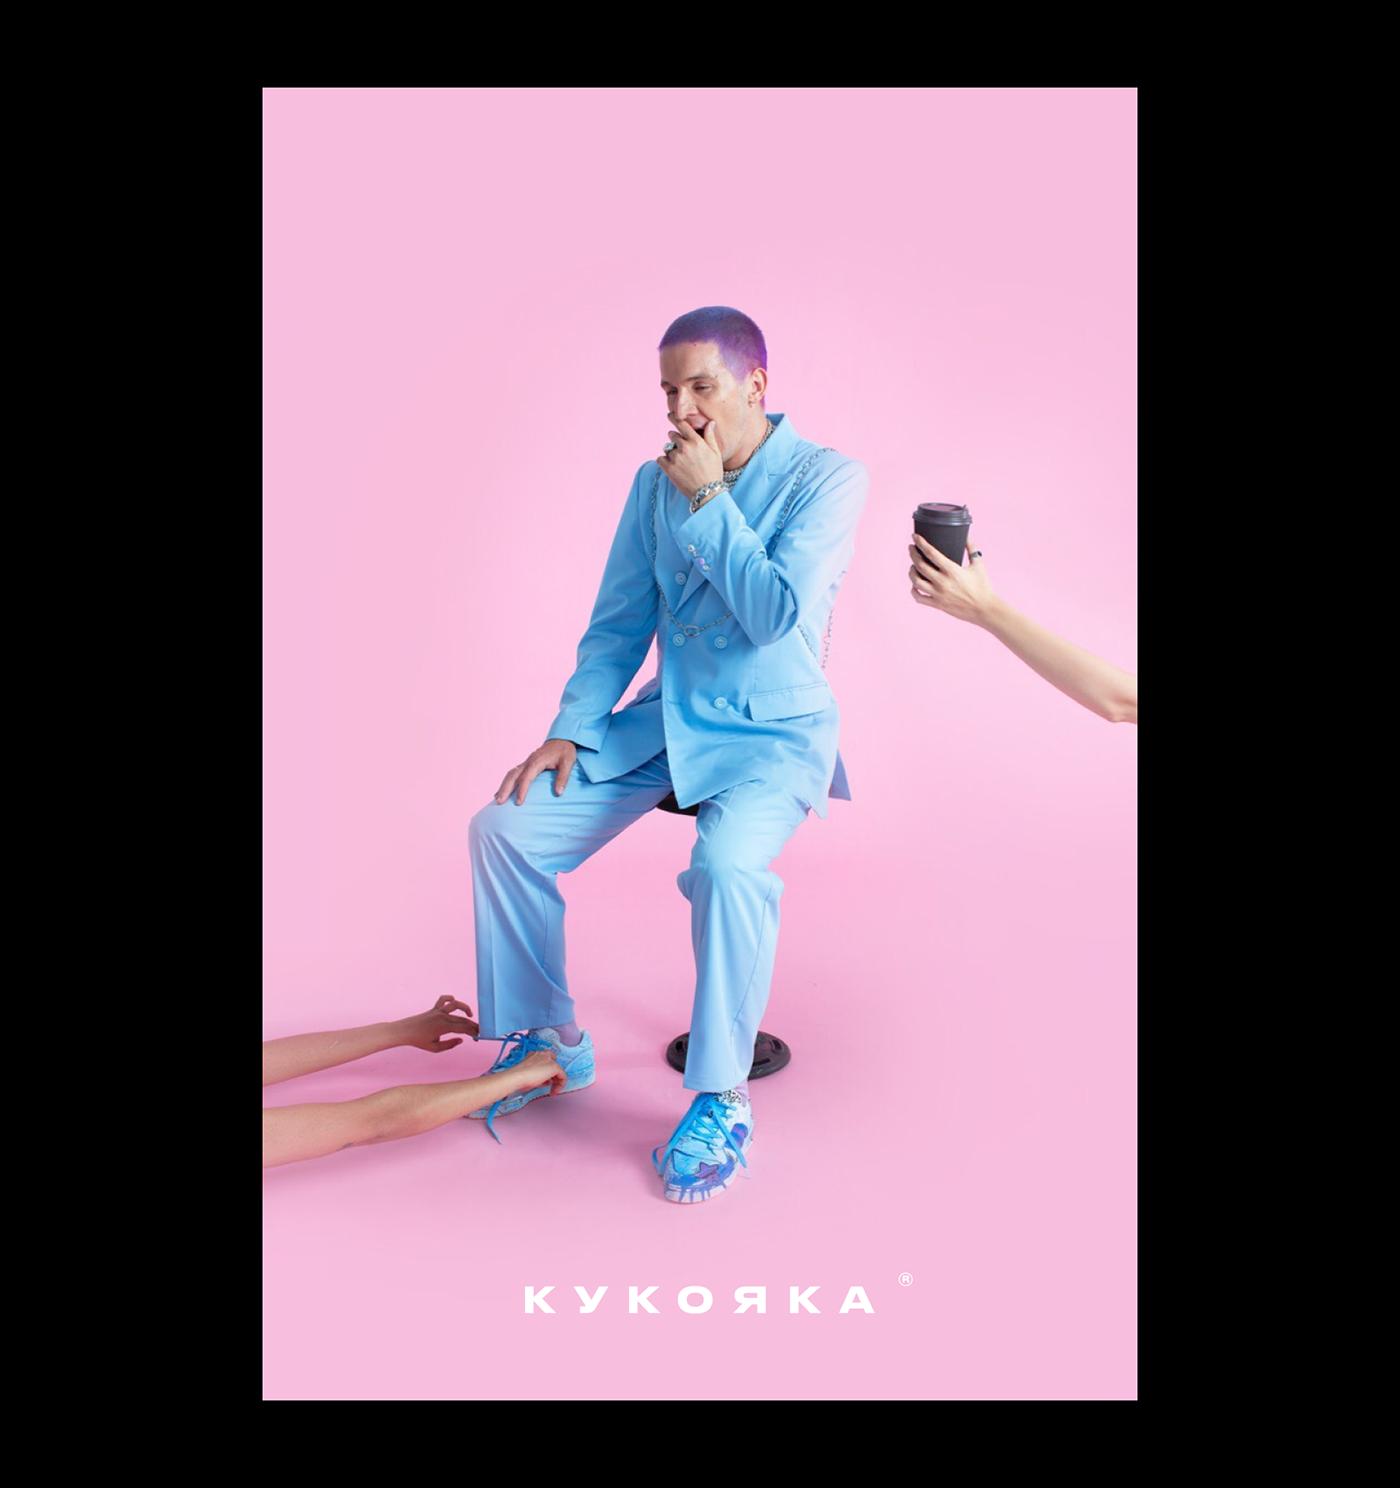 hip hop identity Logotype Merch music photo pink Website Кукояка хлеб